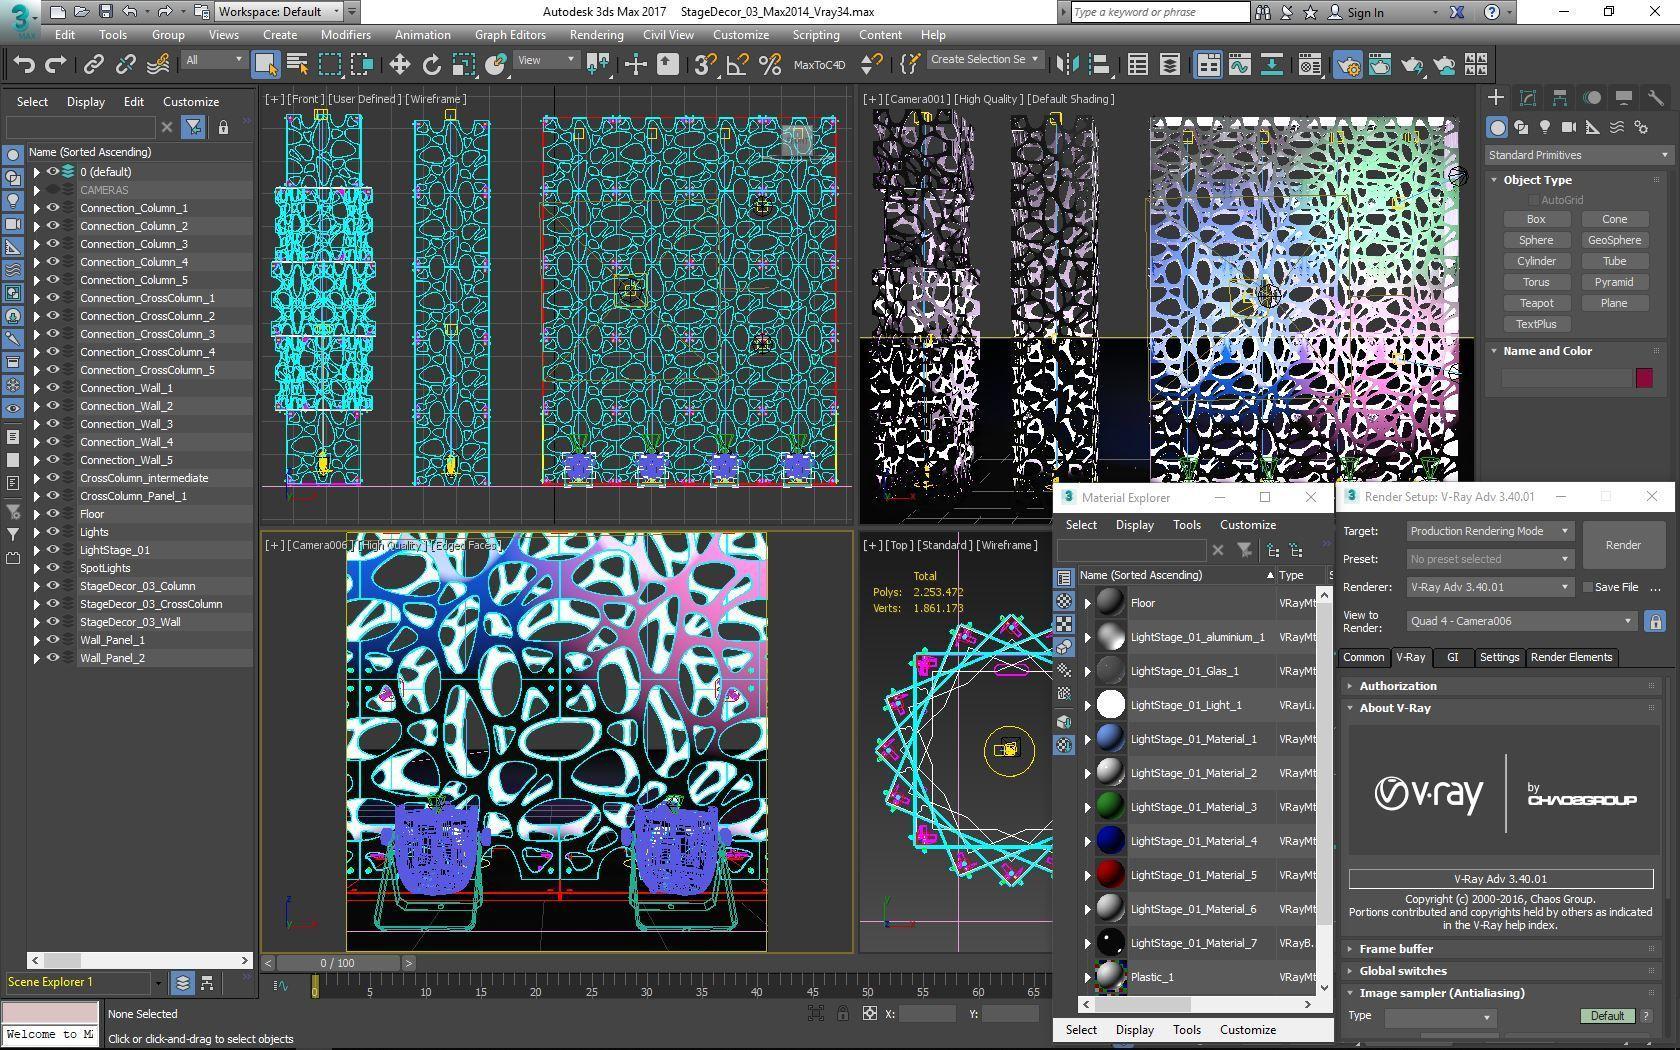 70-Max-03-01-1680.JPG Download STL file Stage Decor Collection 01 (Modular 9 Pieces) • 3D printer model, akerStudio